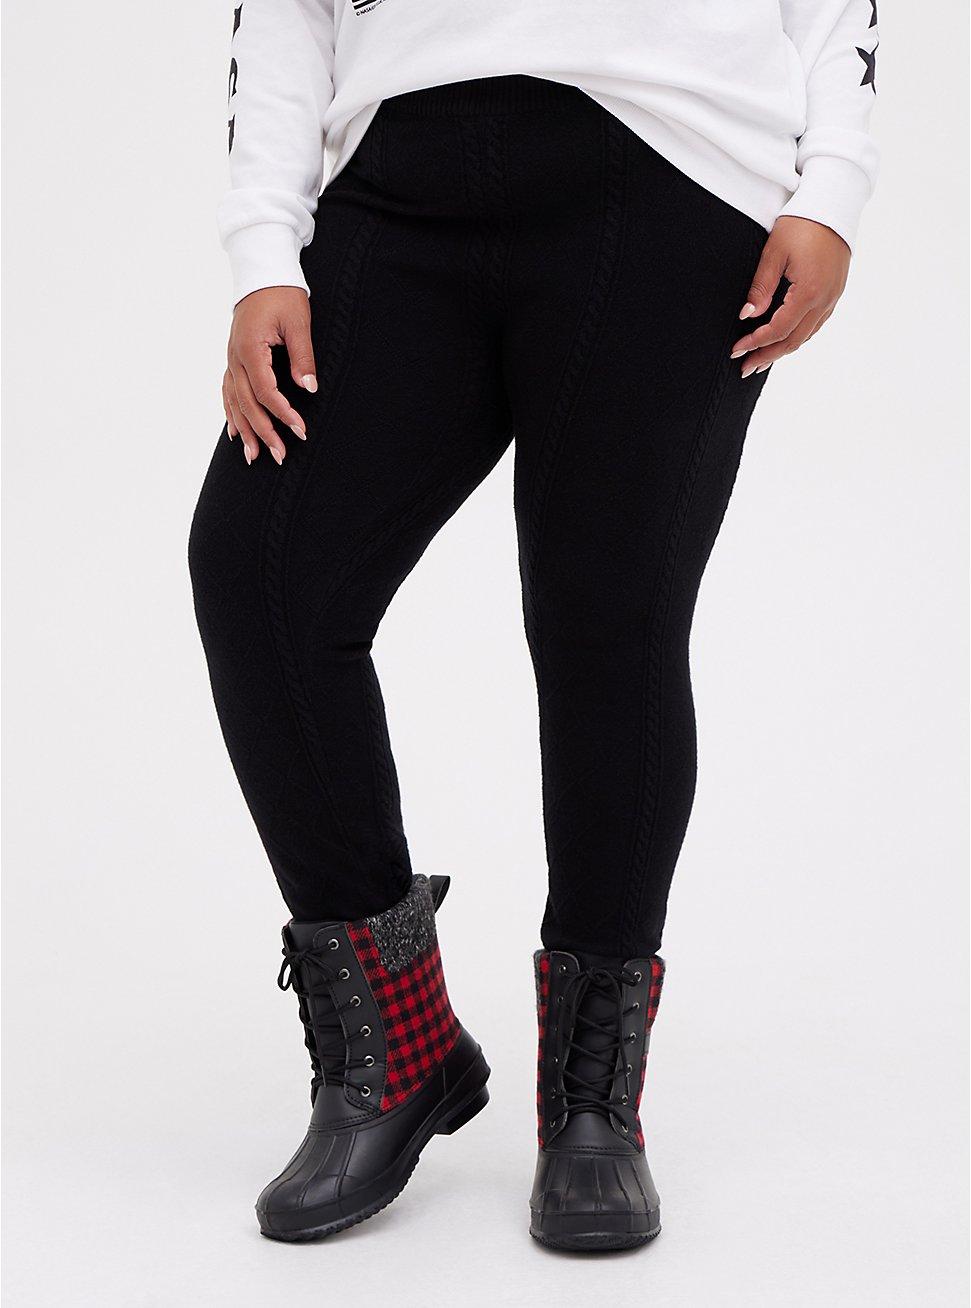 Platinum Legging - Cable Knit Black , BLACK, hi-res